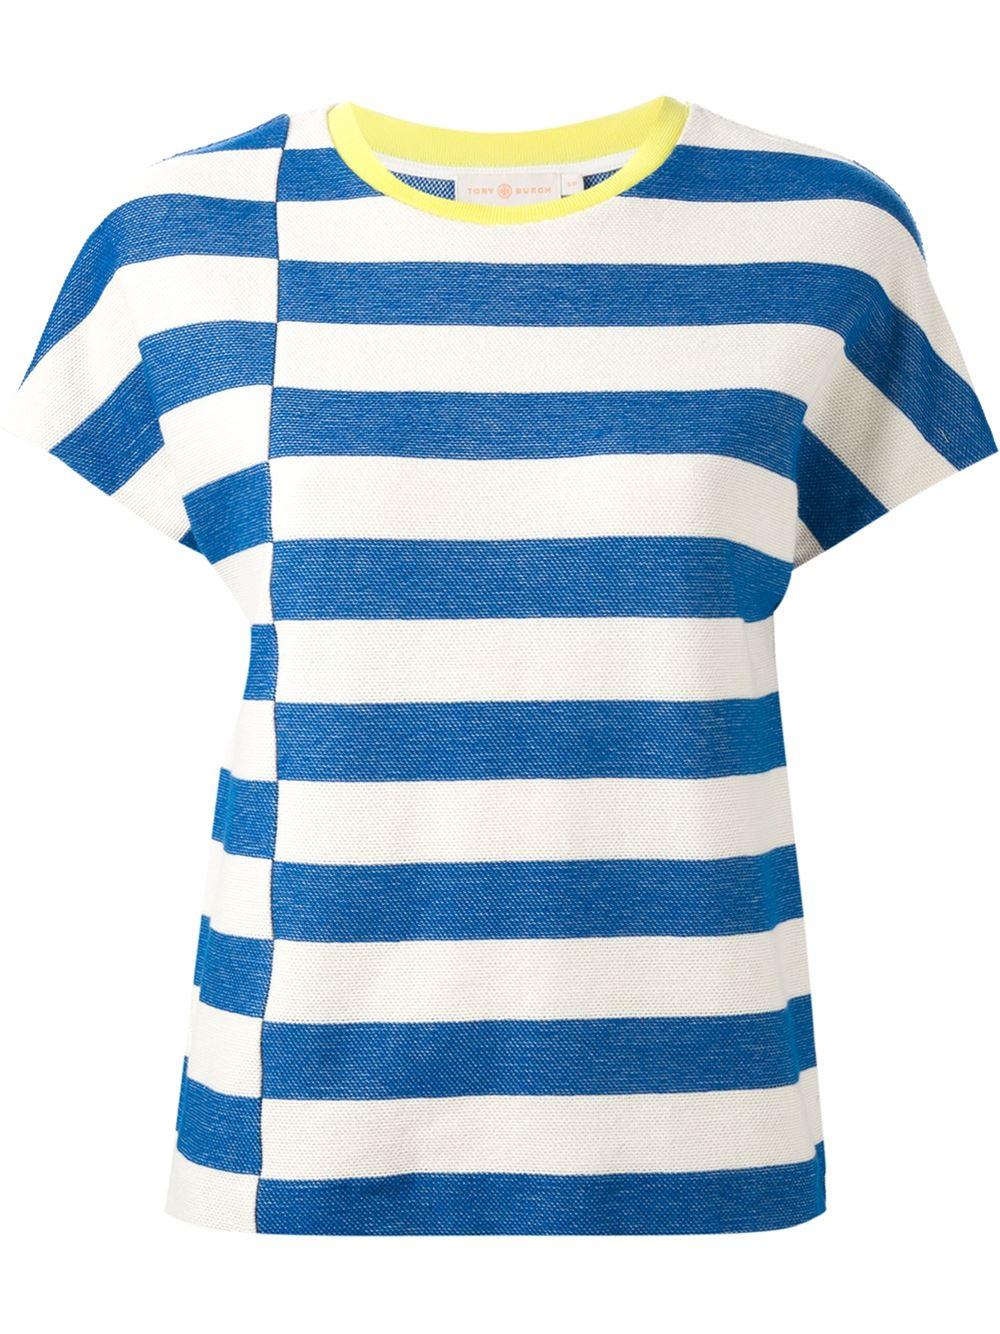 Tory burch striped t shirt in blue lyst for Tory burch t shirt